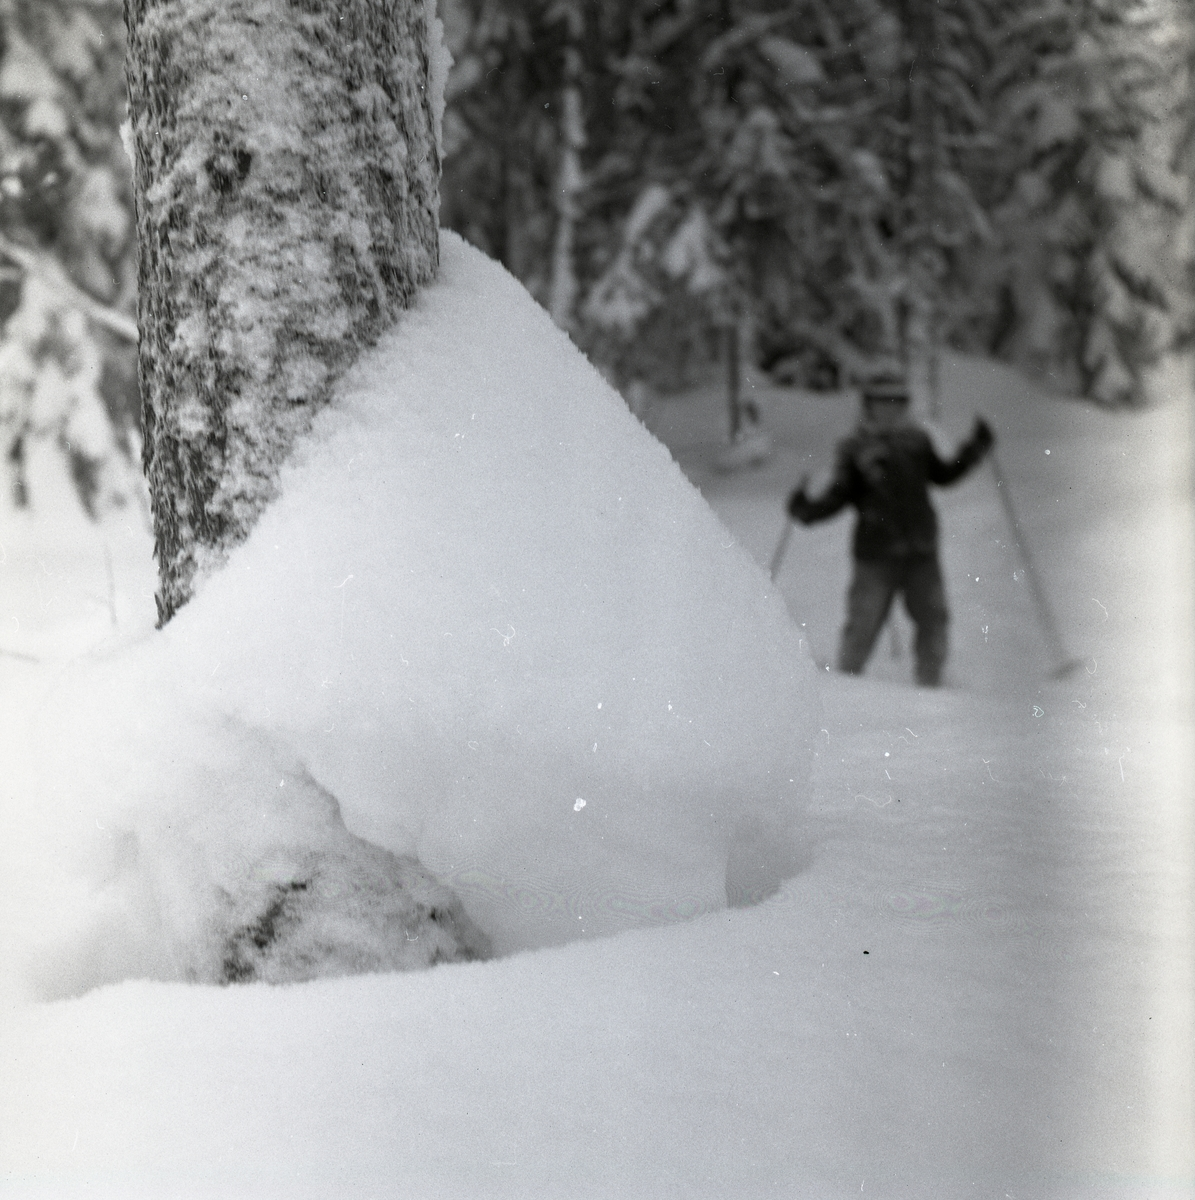 "Ett träd med snödriva mot stammen, ""snökrage"", på Heden 23 december 1955. I bakgrunden syns en pojke som åker skidor."